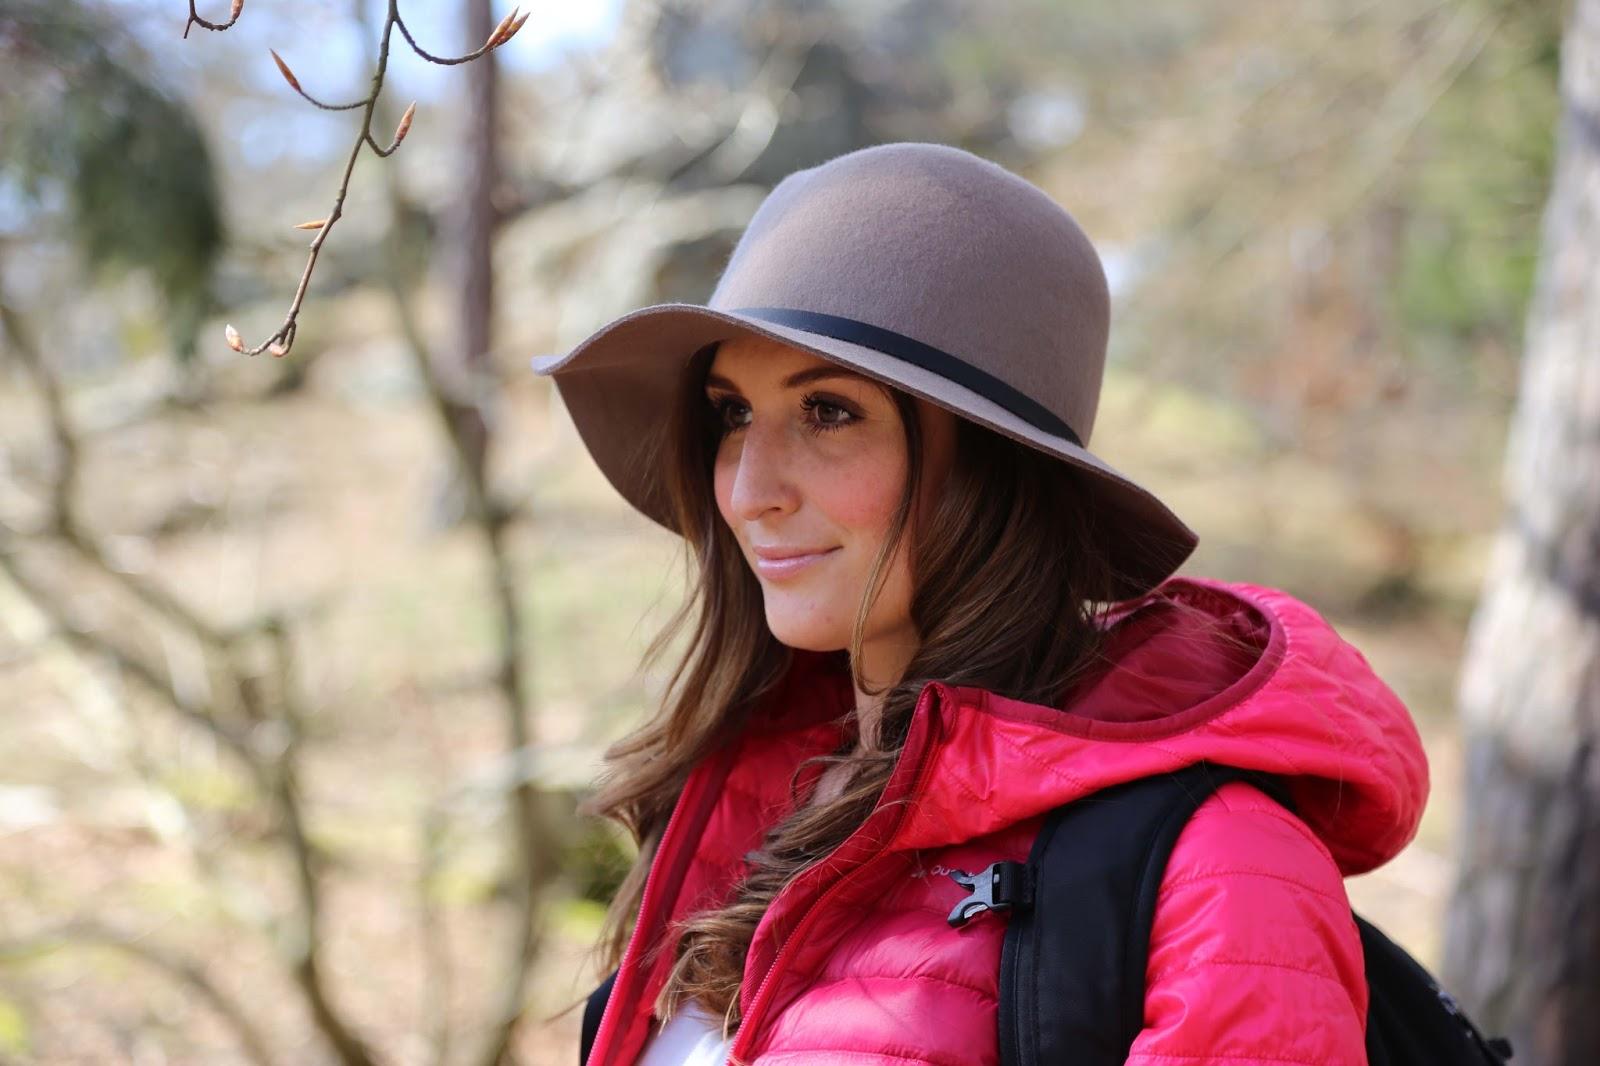 Fashionblogger - Blogger aus Frankfurt Fashionblog - Deutsche Fashionblogger - Outdoor Outfit- Decathlon Jacke